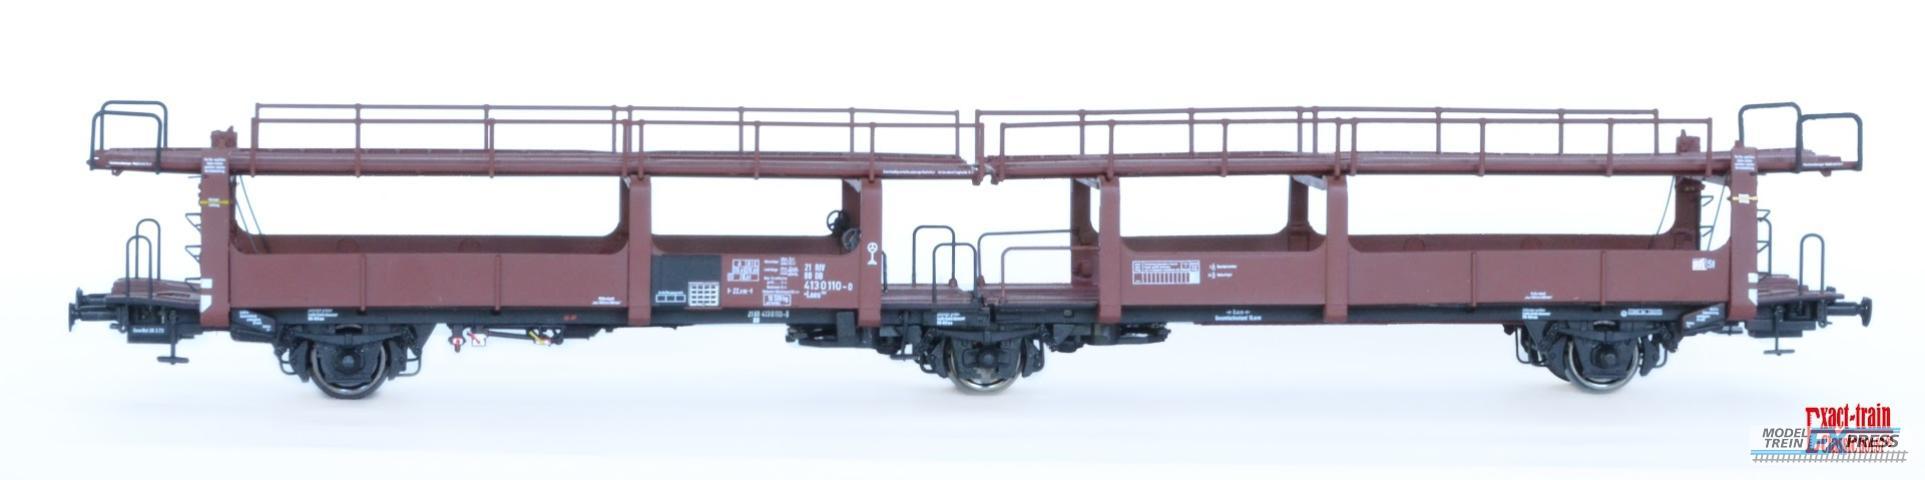 Exact-train 20019